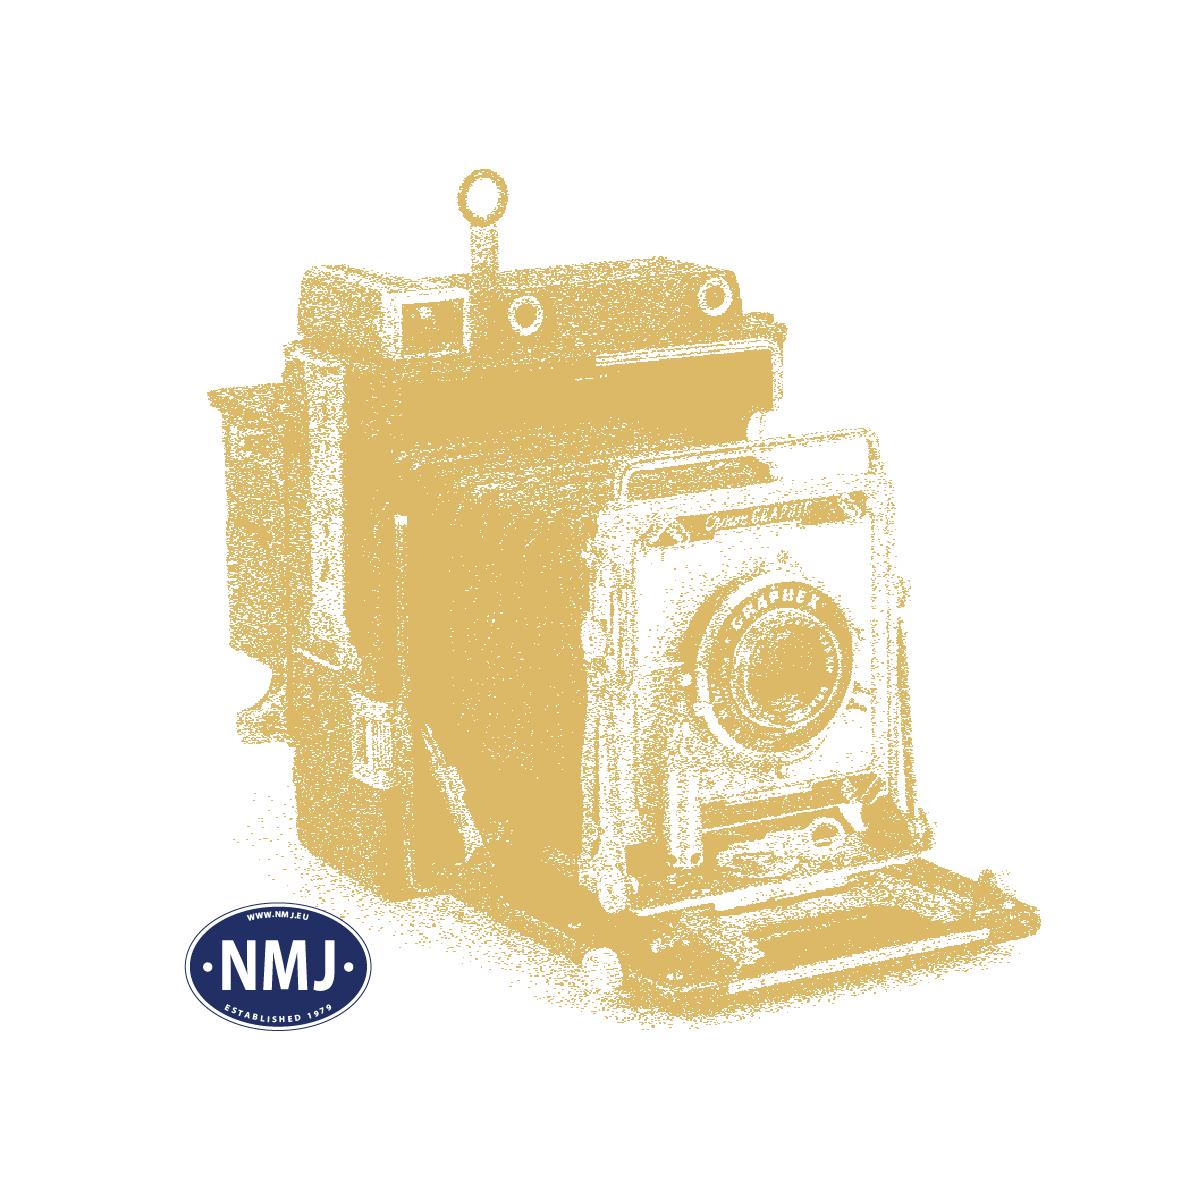 NMJT504.203 - NMJ Topline NSB G5 44201, type 2 original version